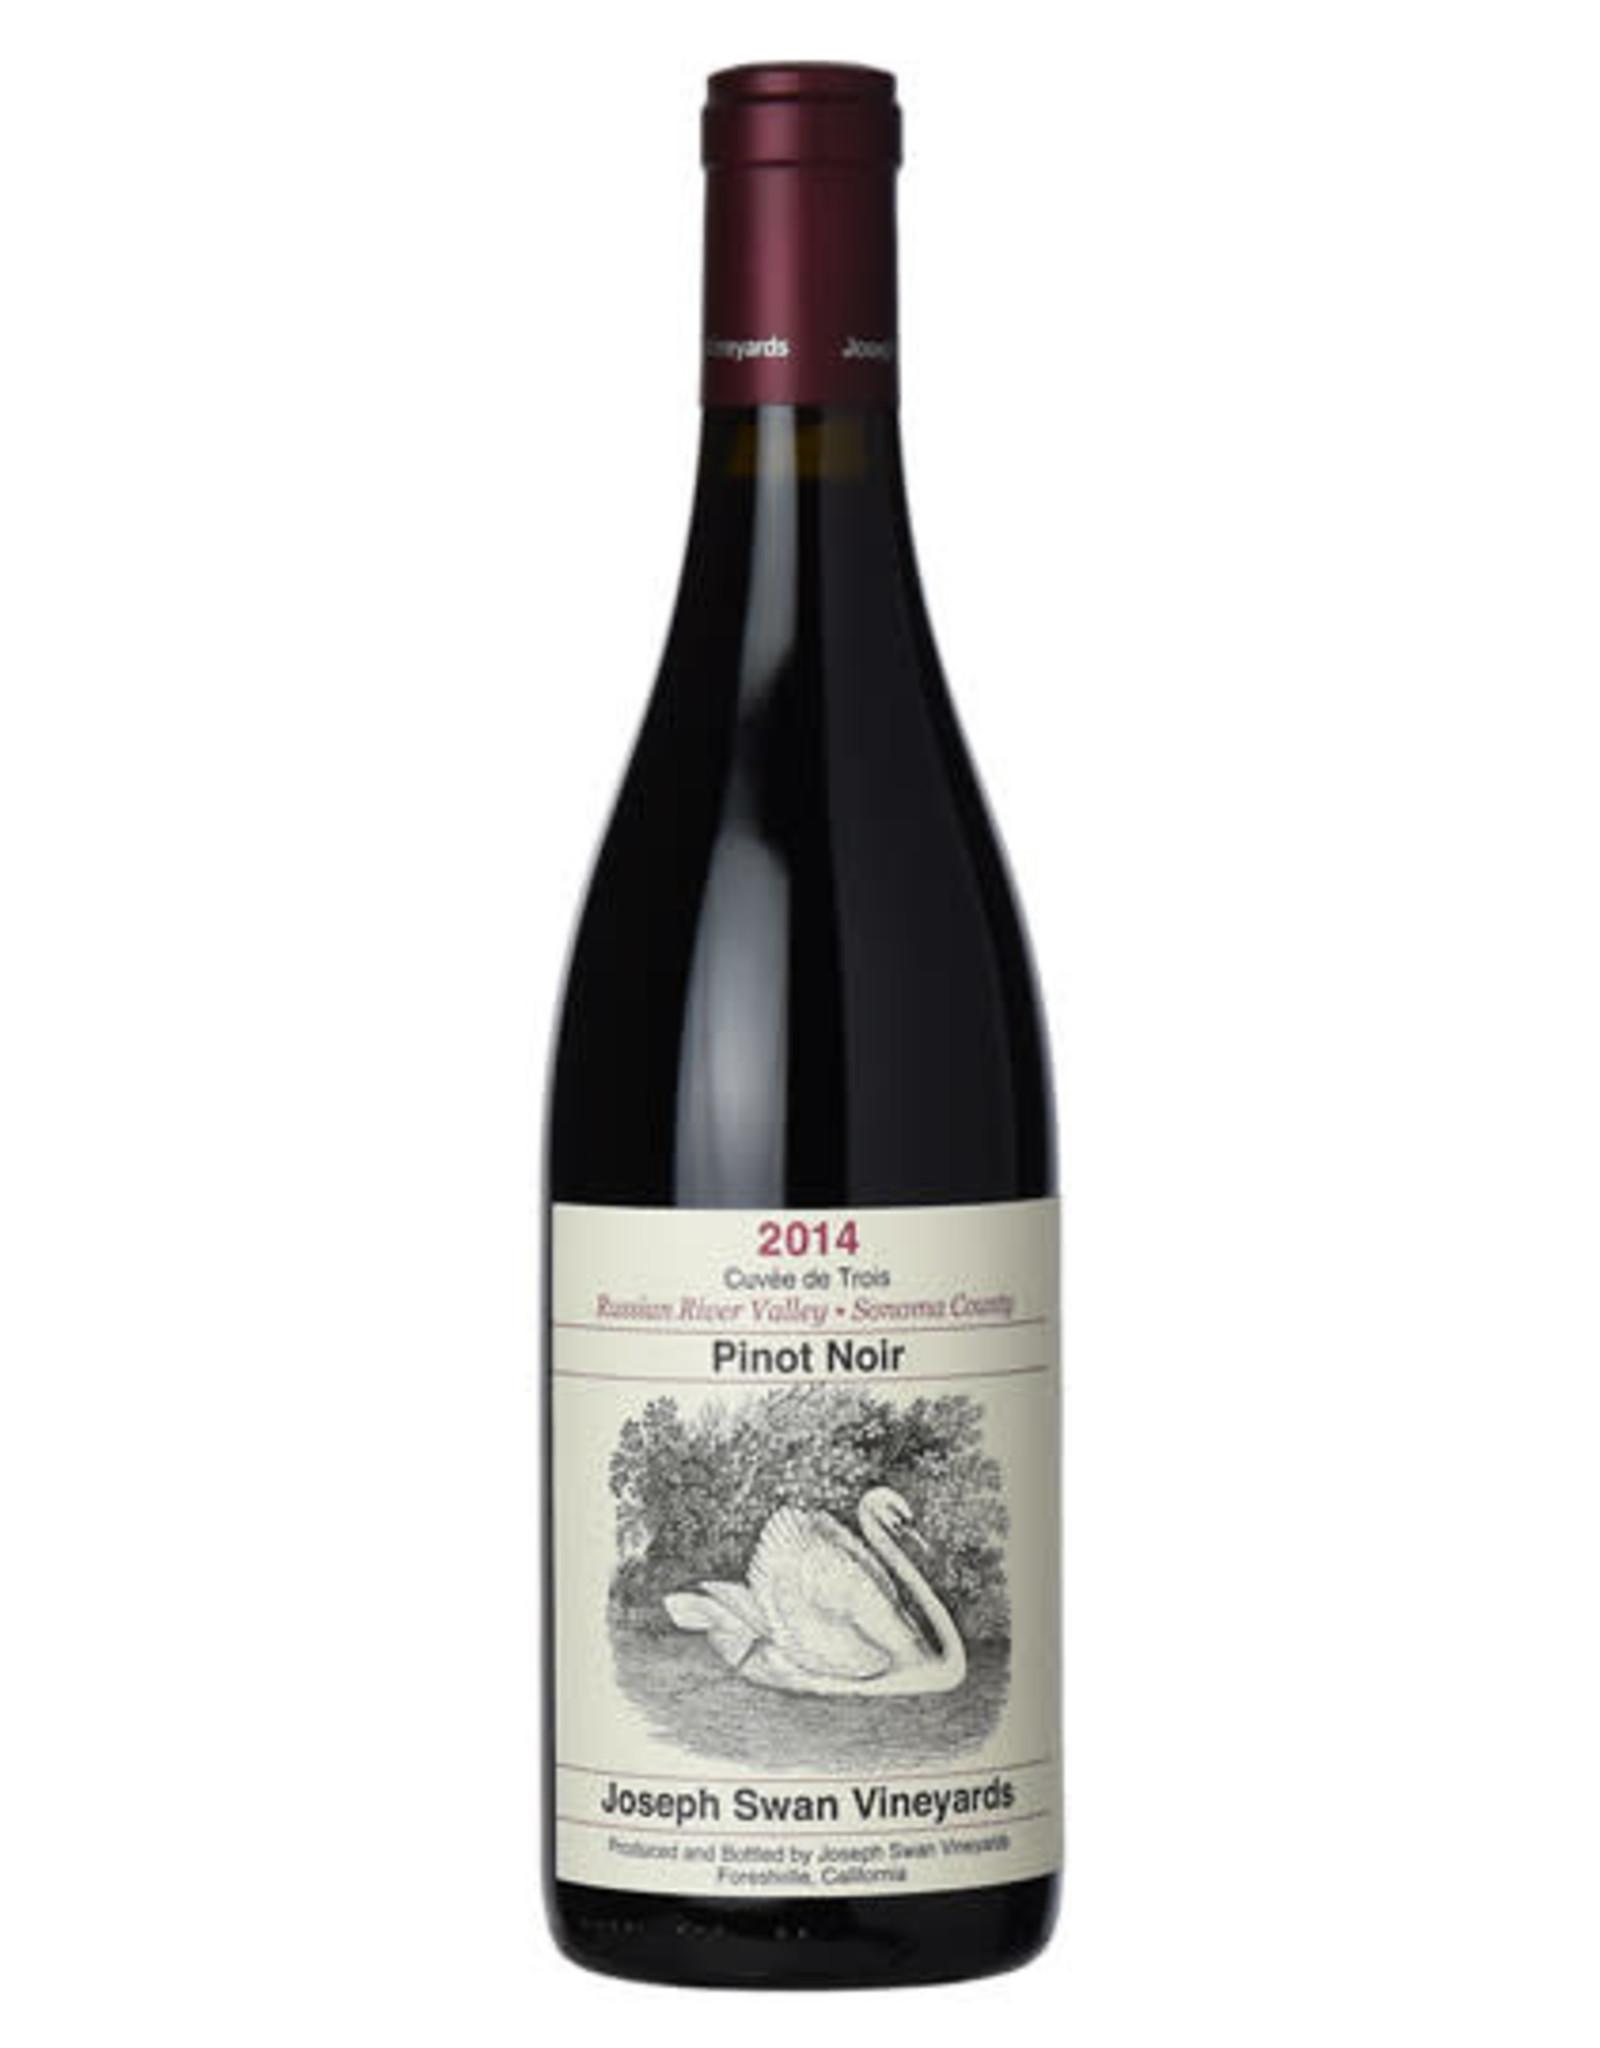 Joseph Swan Cuvee de Trois Pinot Noir 2014